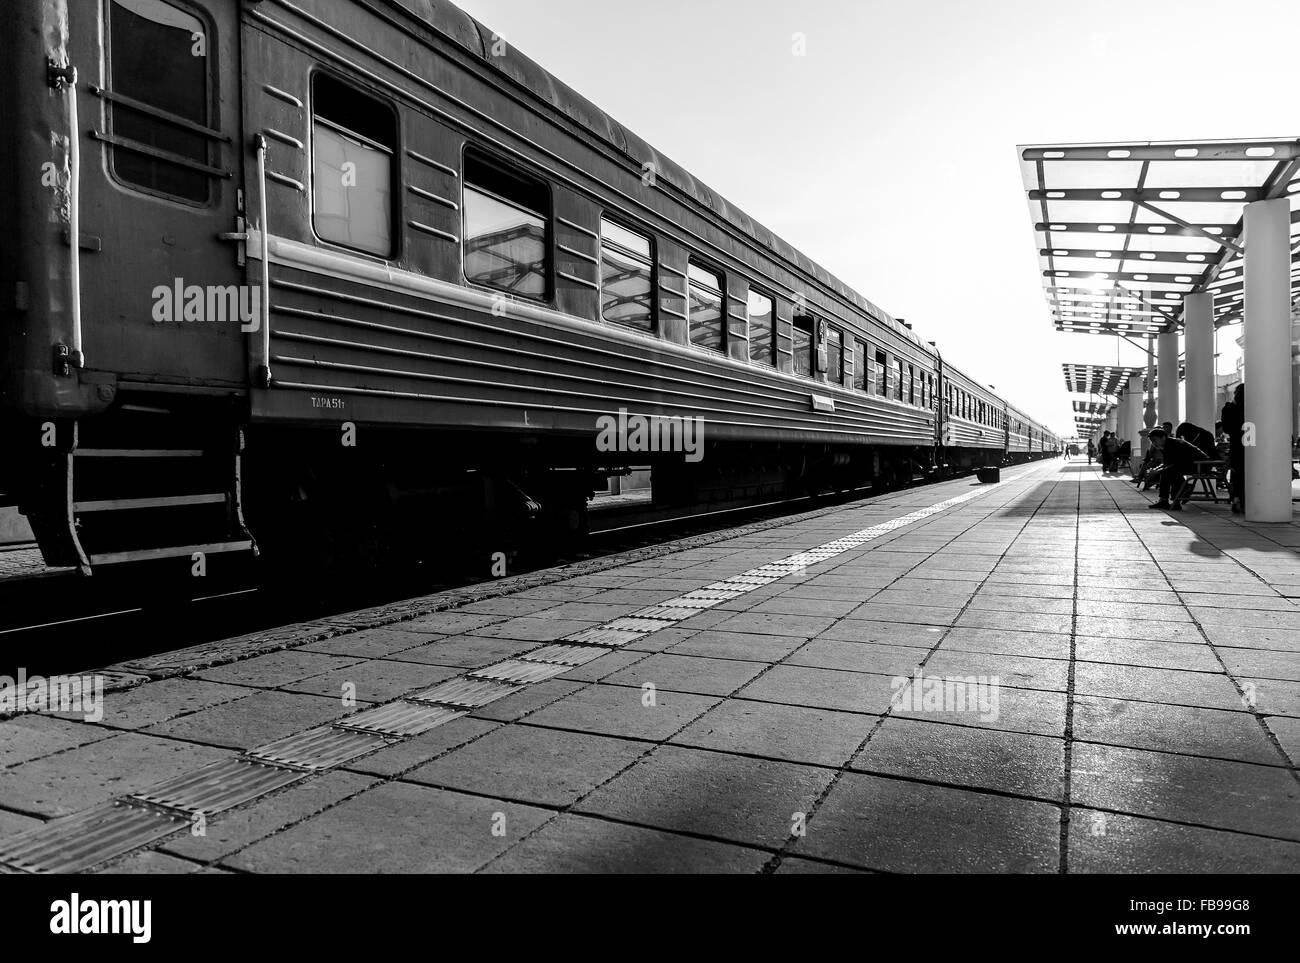 Old train at the main train station in Ulaanbaatar, Mongolia - Stock Image